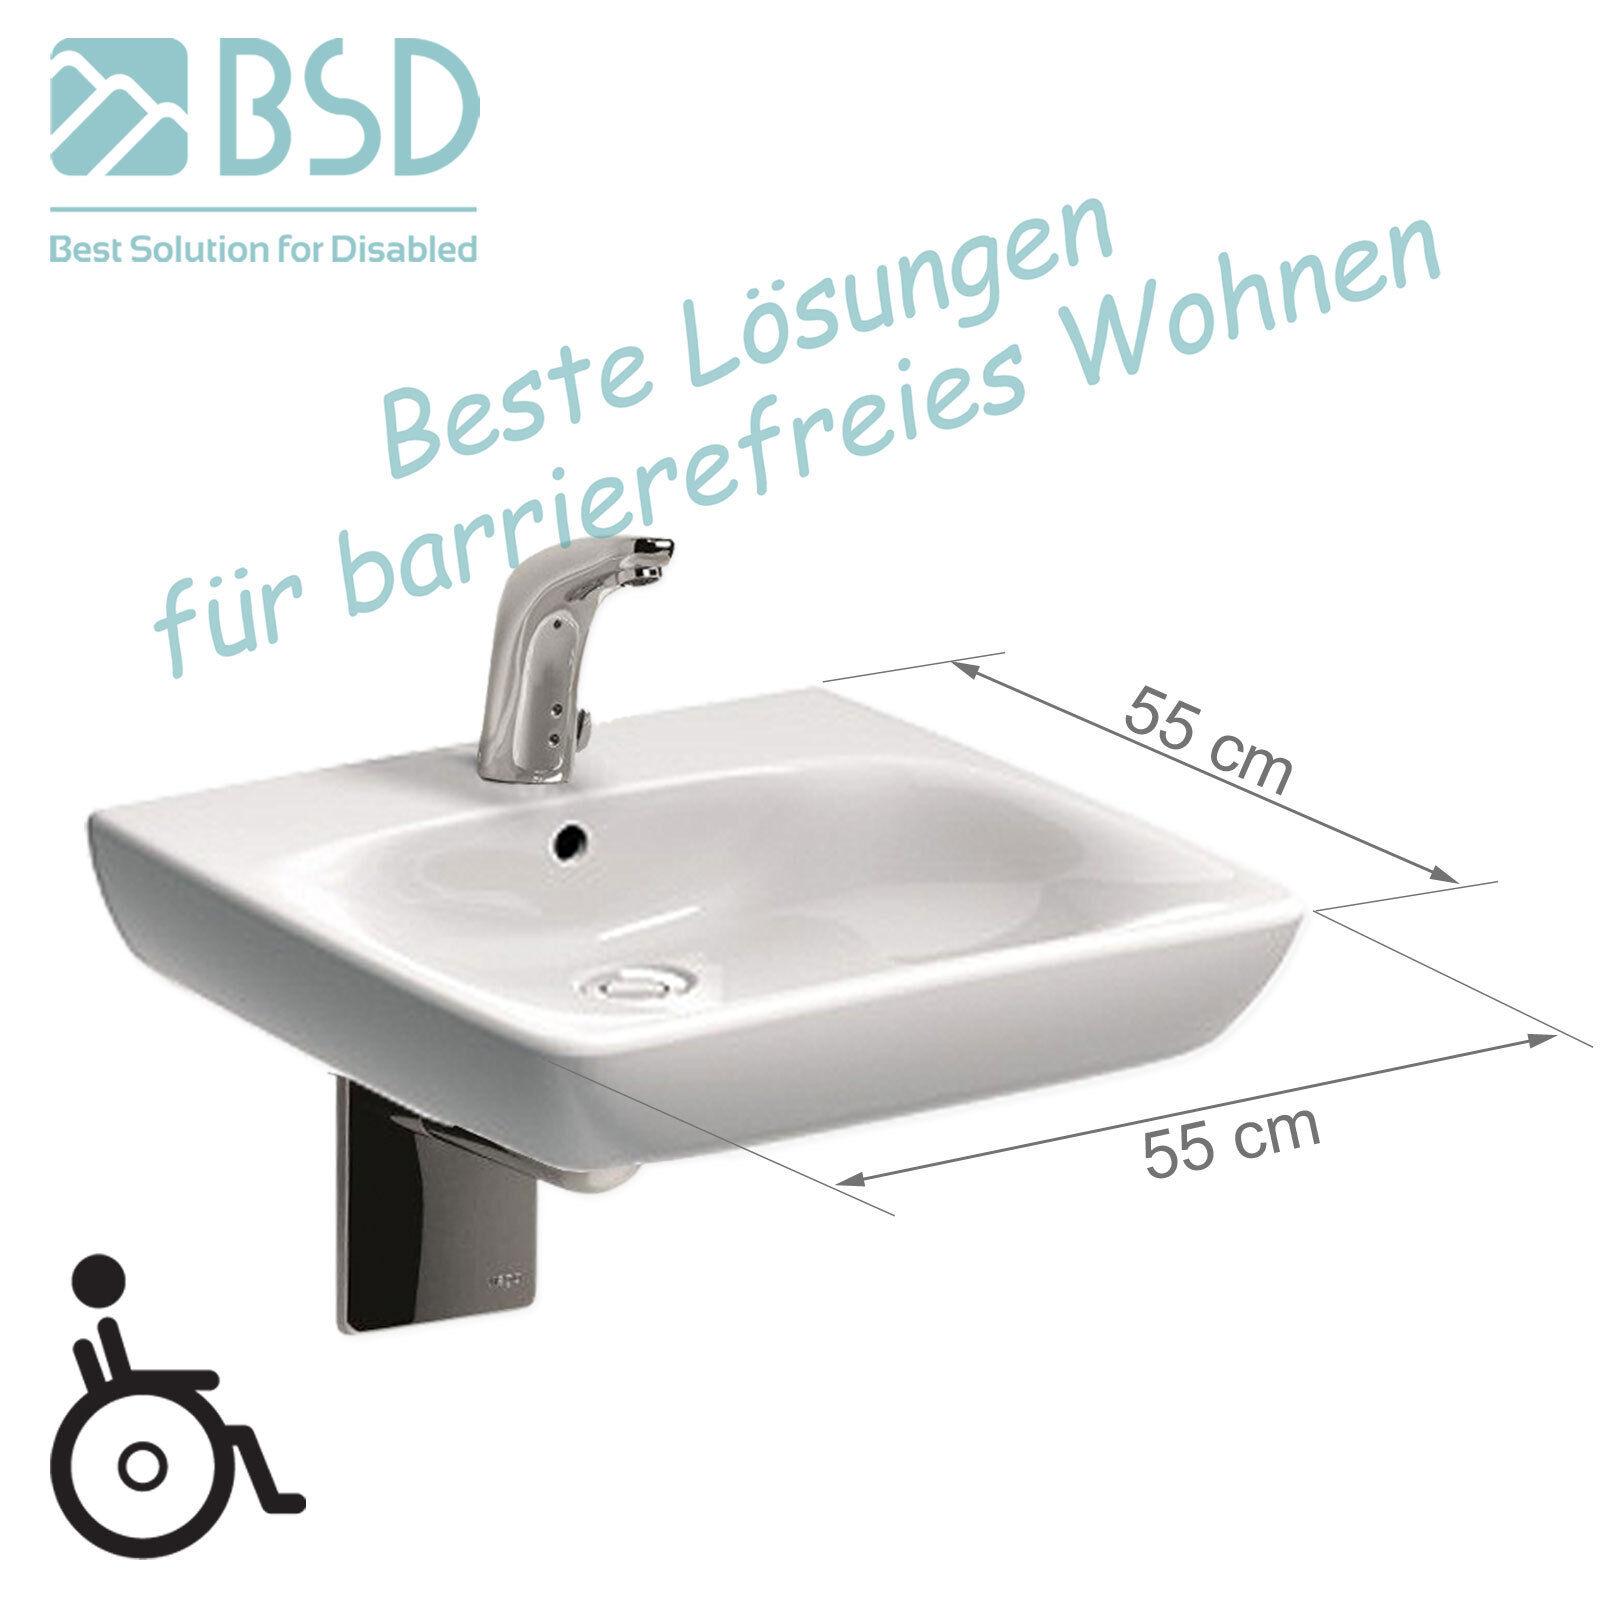 waschbecken behindertengerecht 55 cm siphon waschtischarmatur langer hebel eur 95 80. Black Bedroom Furniture Sets. Home Design Ideas